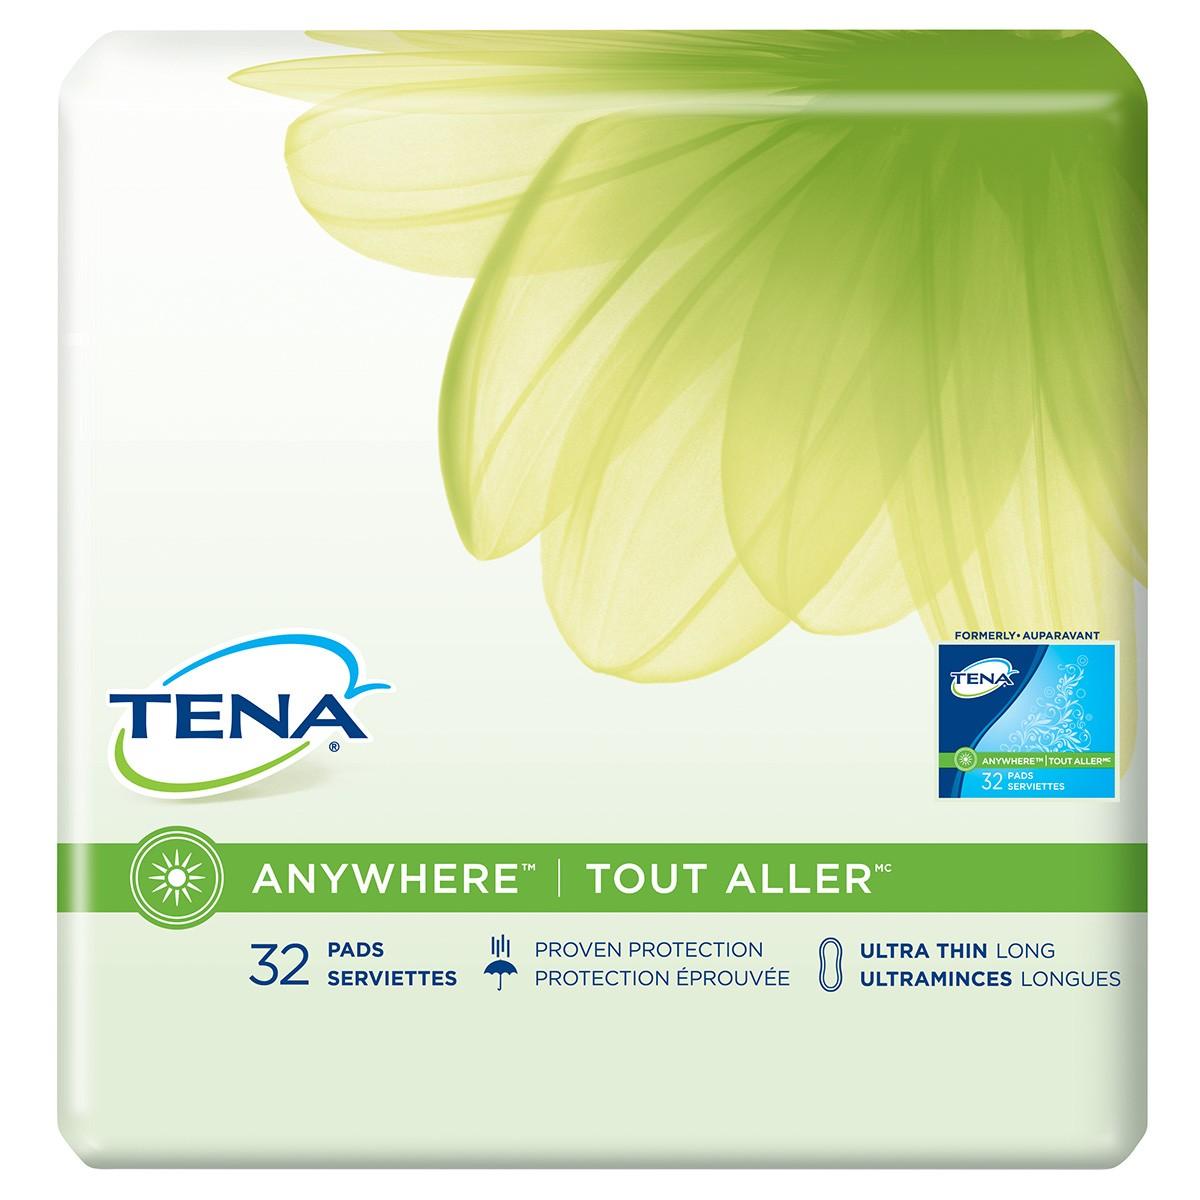 TENA® Anywhere™ Ultra Thin Pads - Long